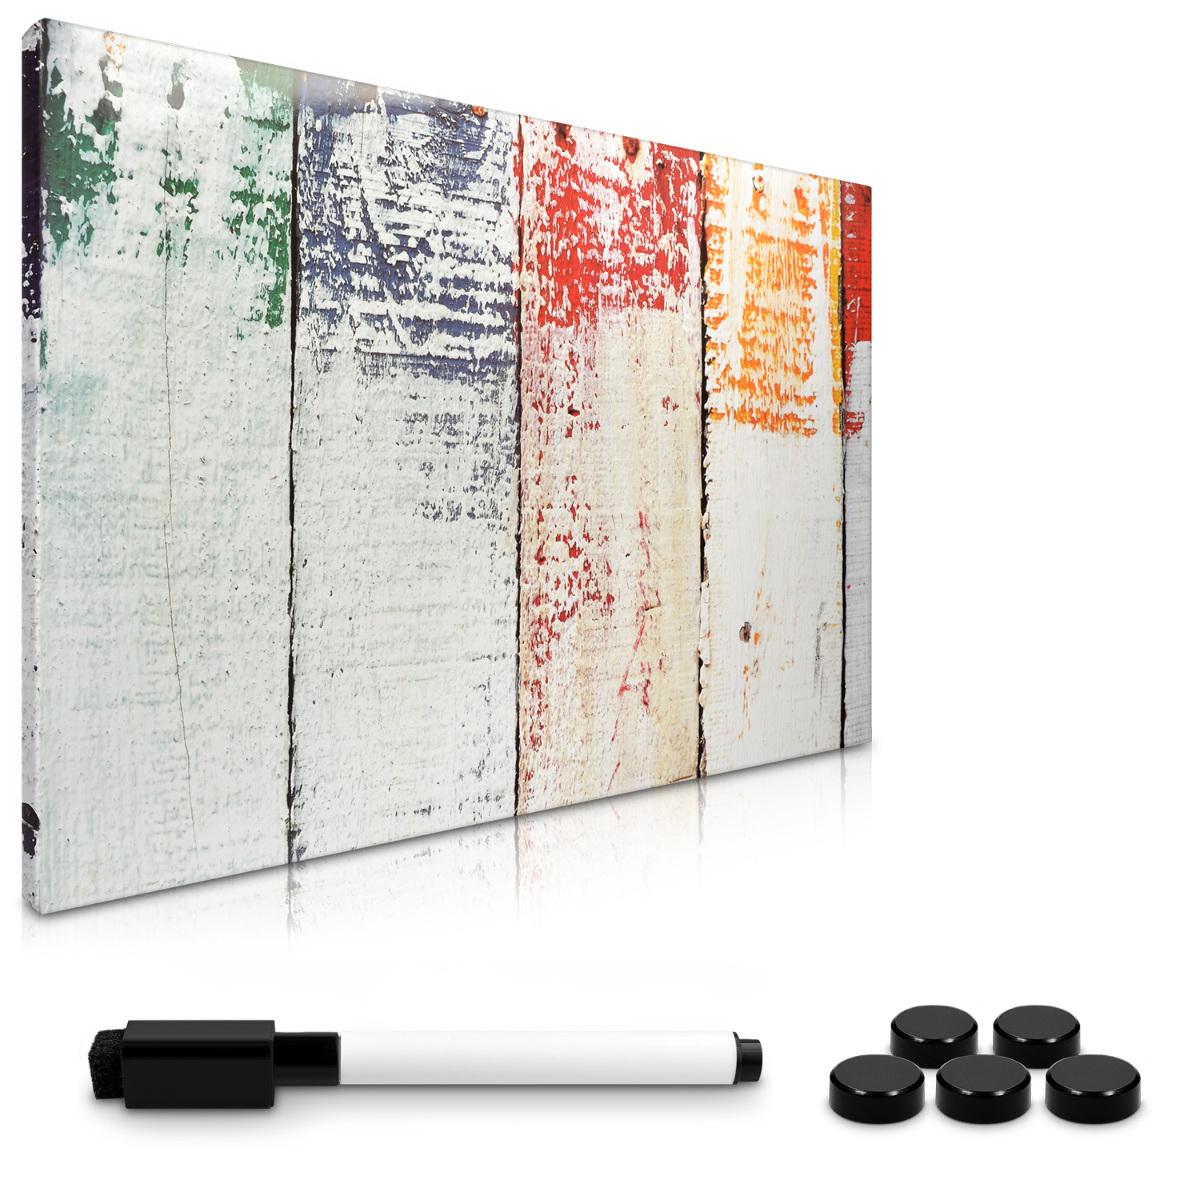 navaris memoboard magnetisch beschriftbar memotafel 40x60 cm messageboard board ebay. Black Bedroom Furniture Sets. Home Design Ideas